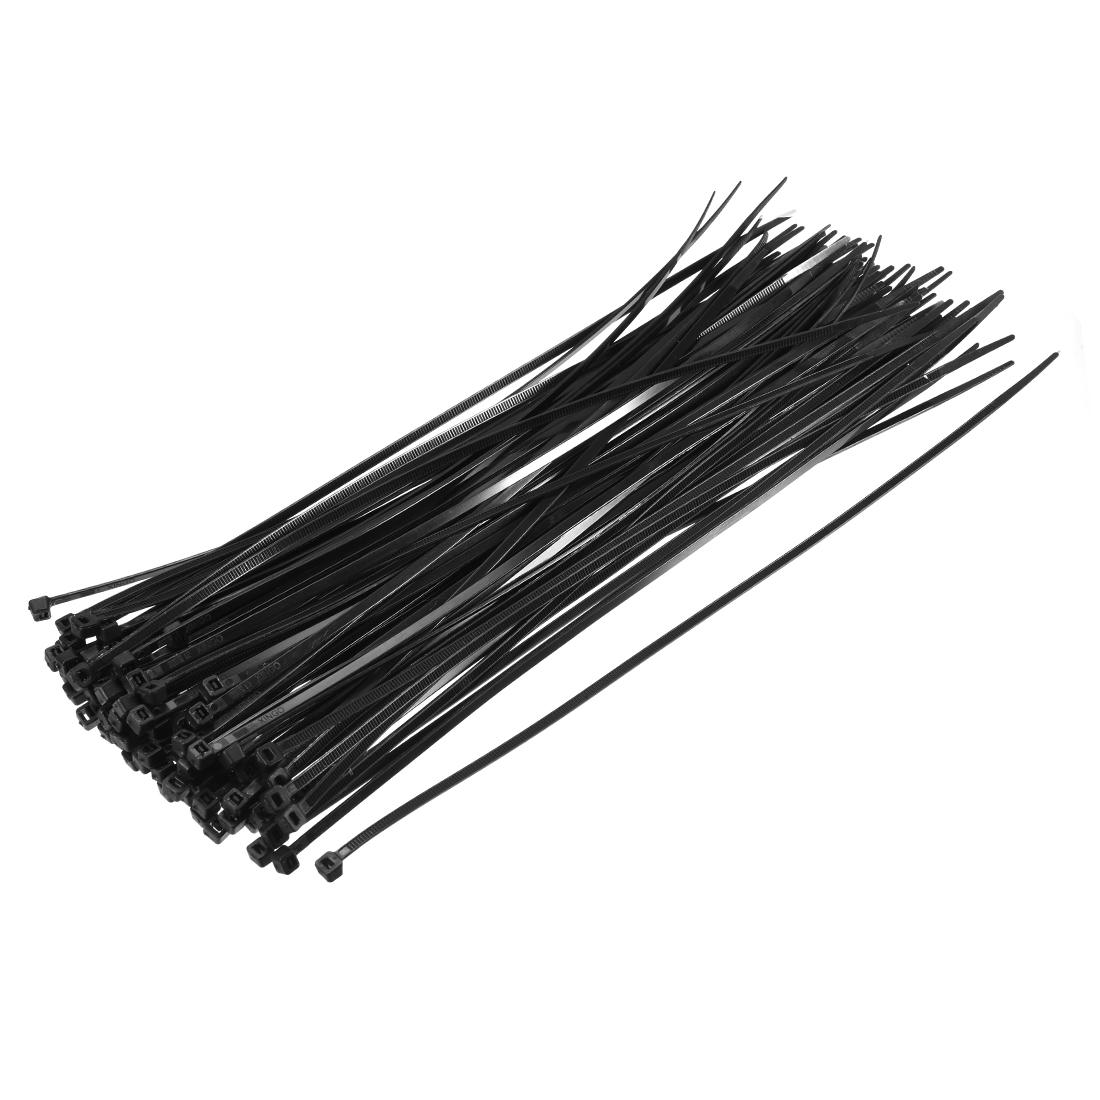 Cable Zip Ties 250mmx3.6mm Self-Locking Nylon Tie Wraps Black 250pcs